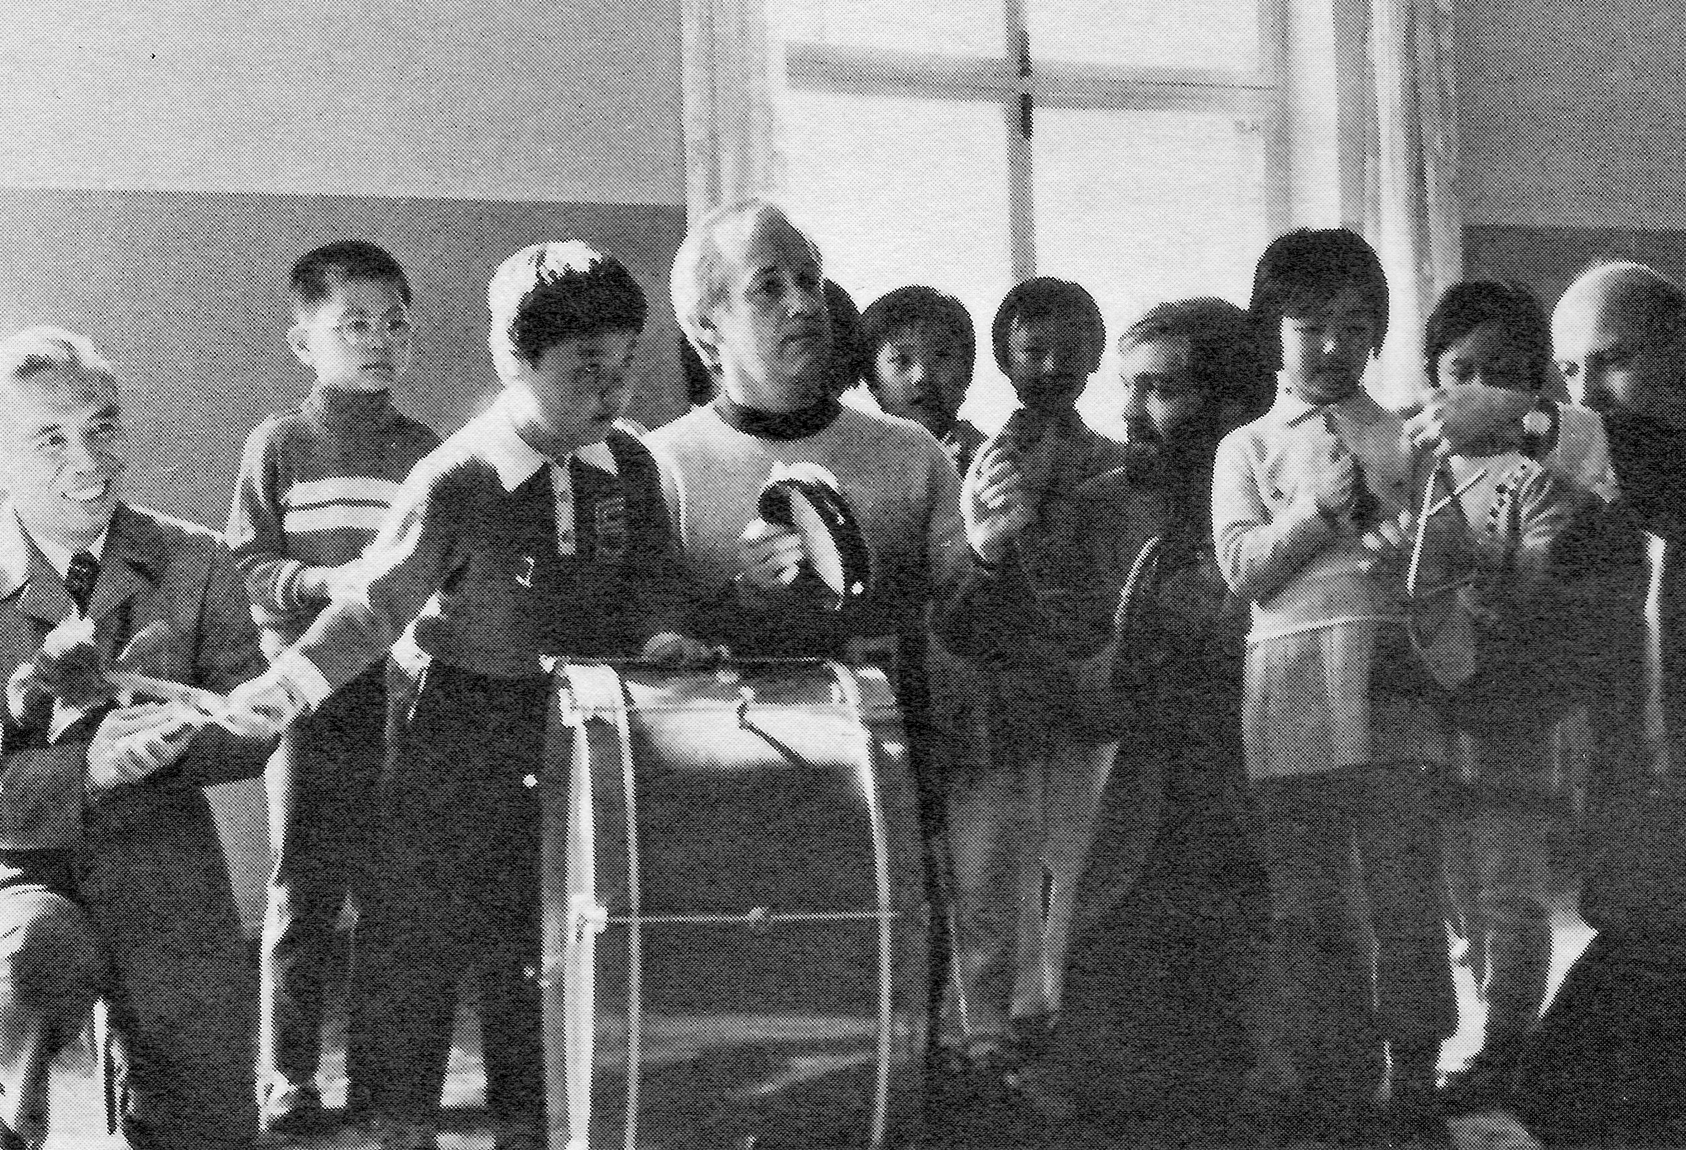 Wu Zuqiang, James Byars, Jon Murray, and Frederick Erickson join Beijing kindergarten students in impromptu music-making